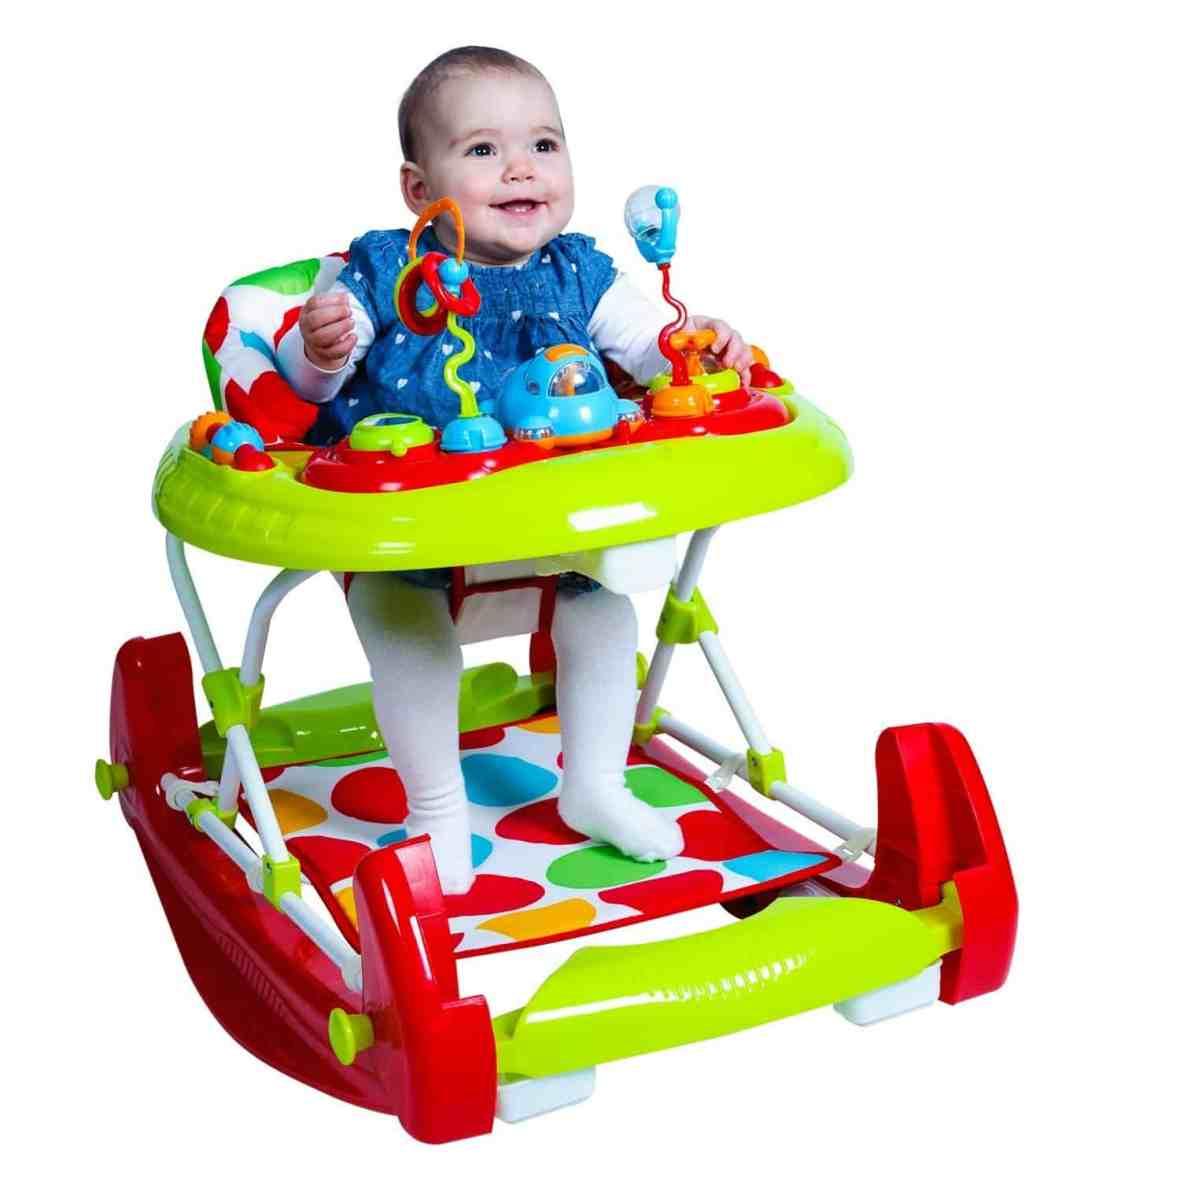 redkite-twist-spot-baby